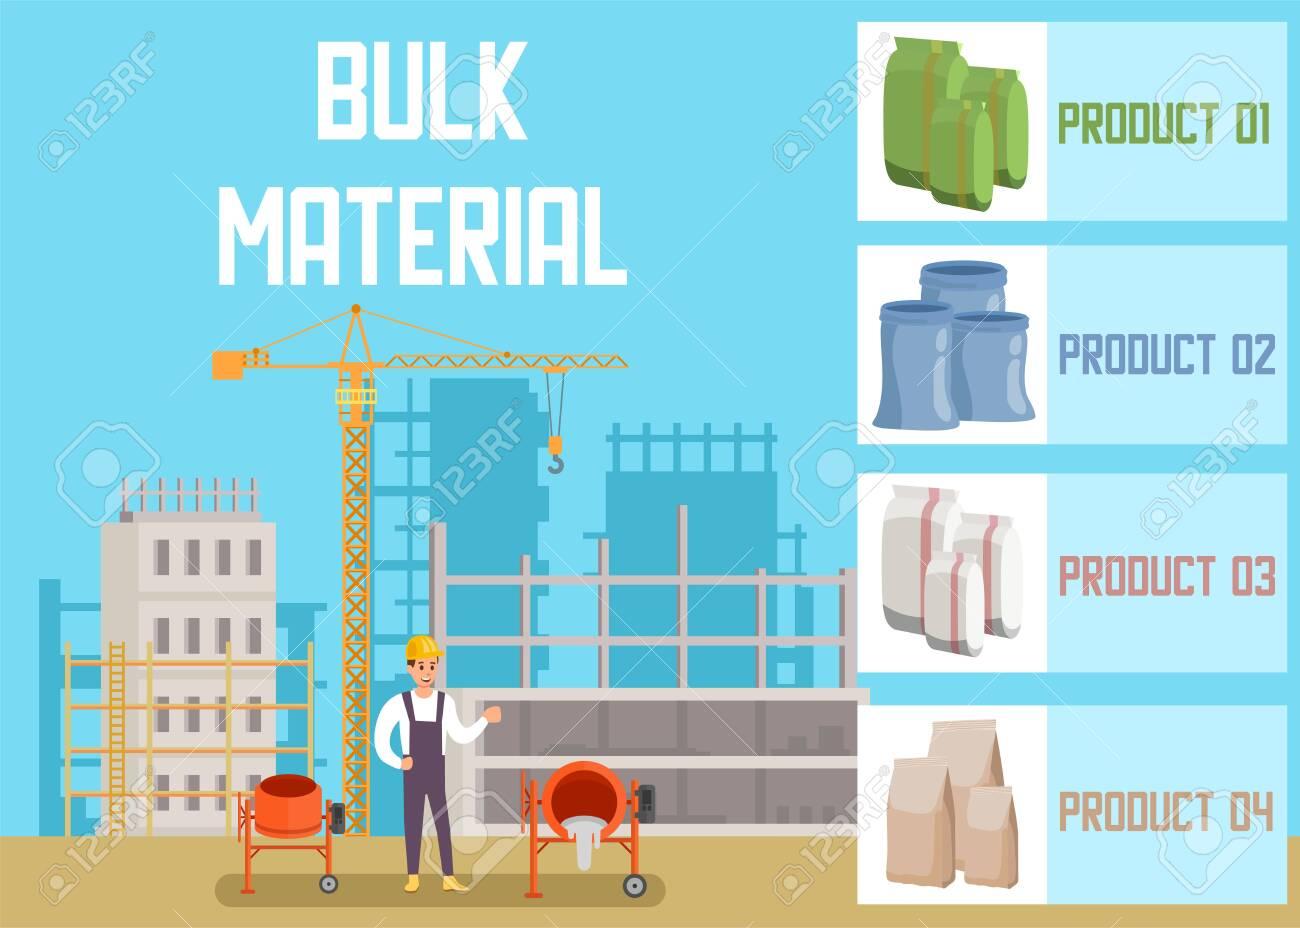 Bulk Building Materials Online Shop Advertising Banner Flat Illustration